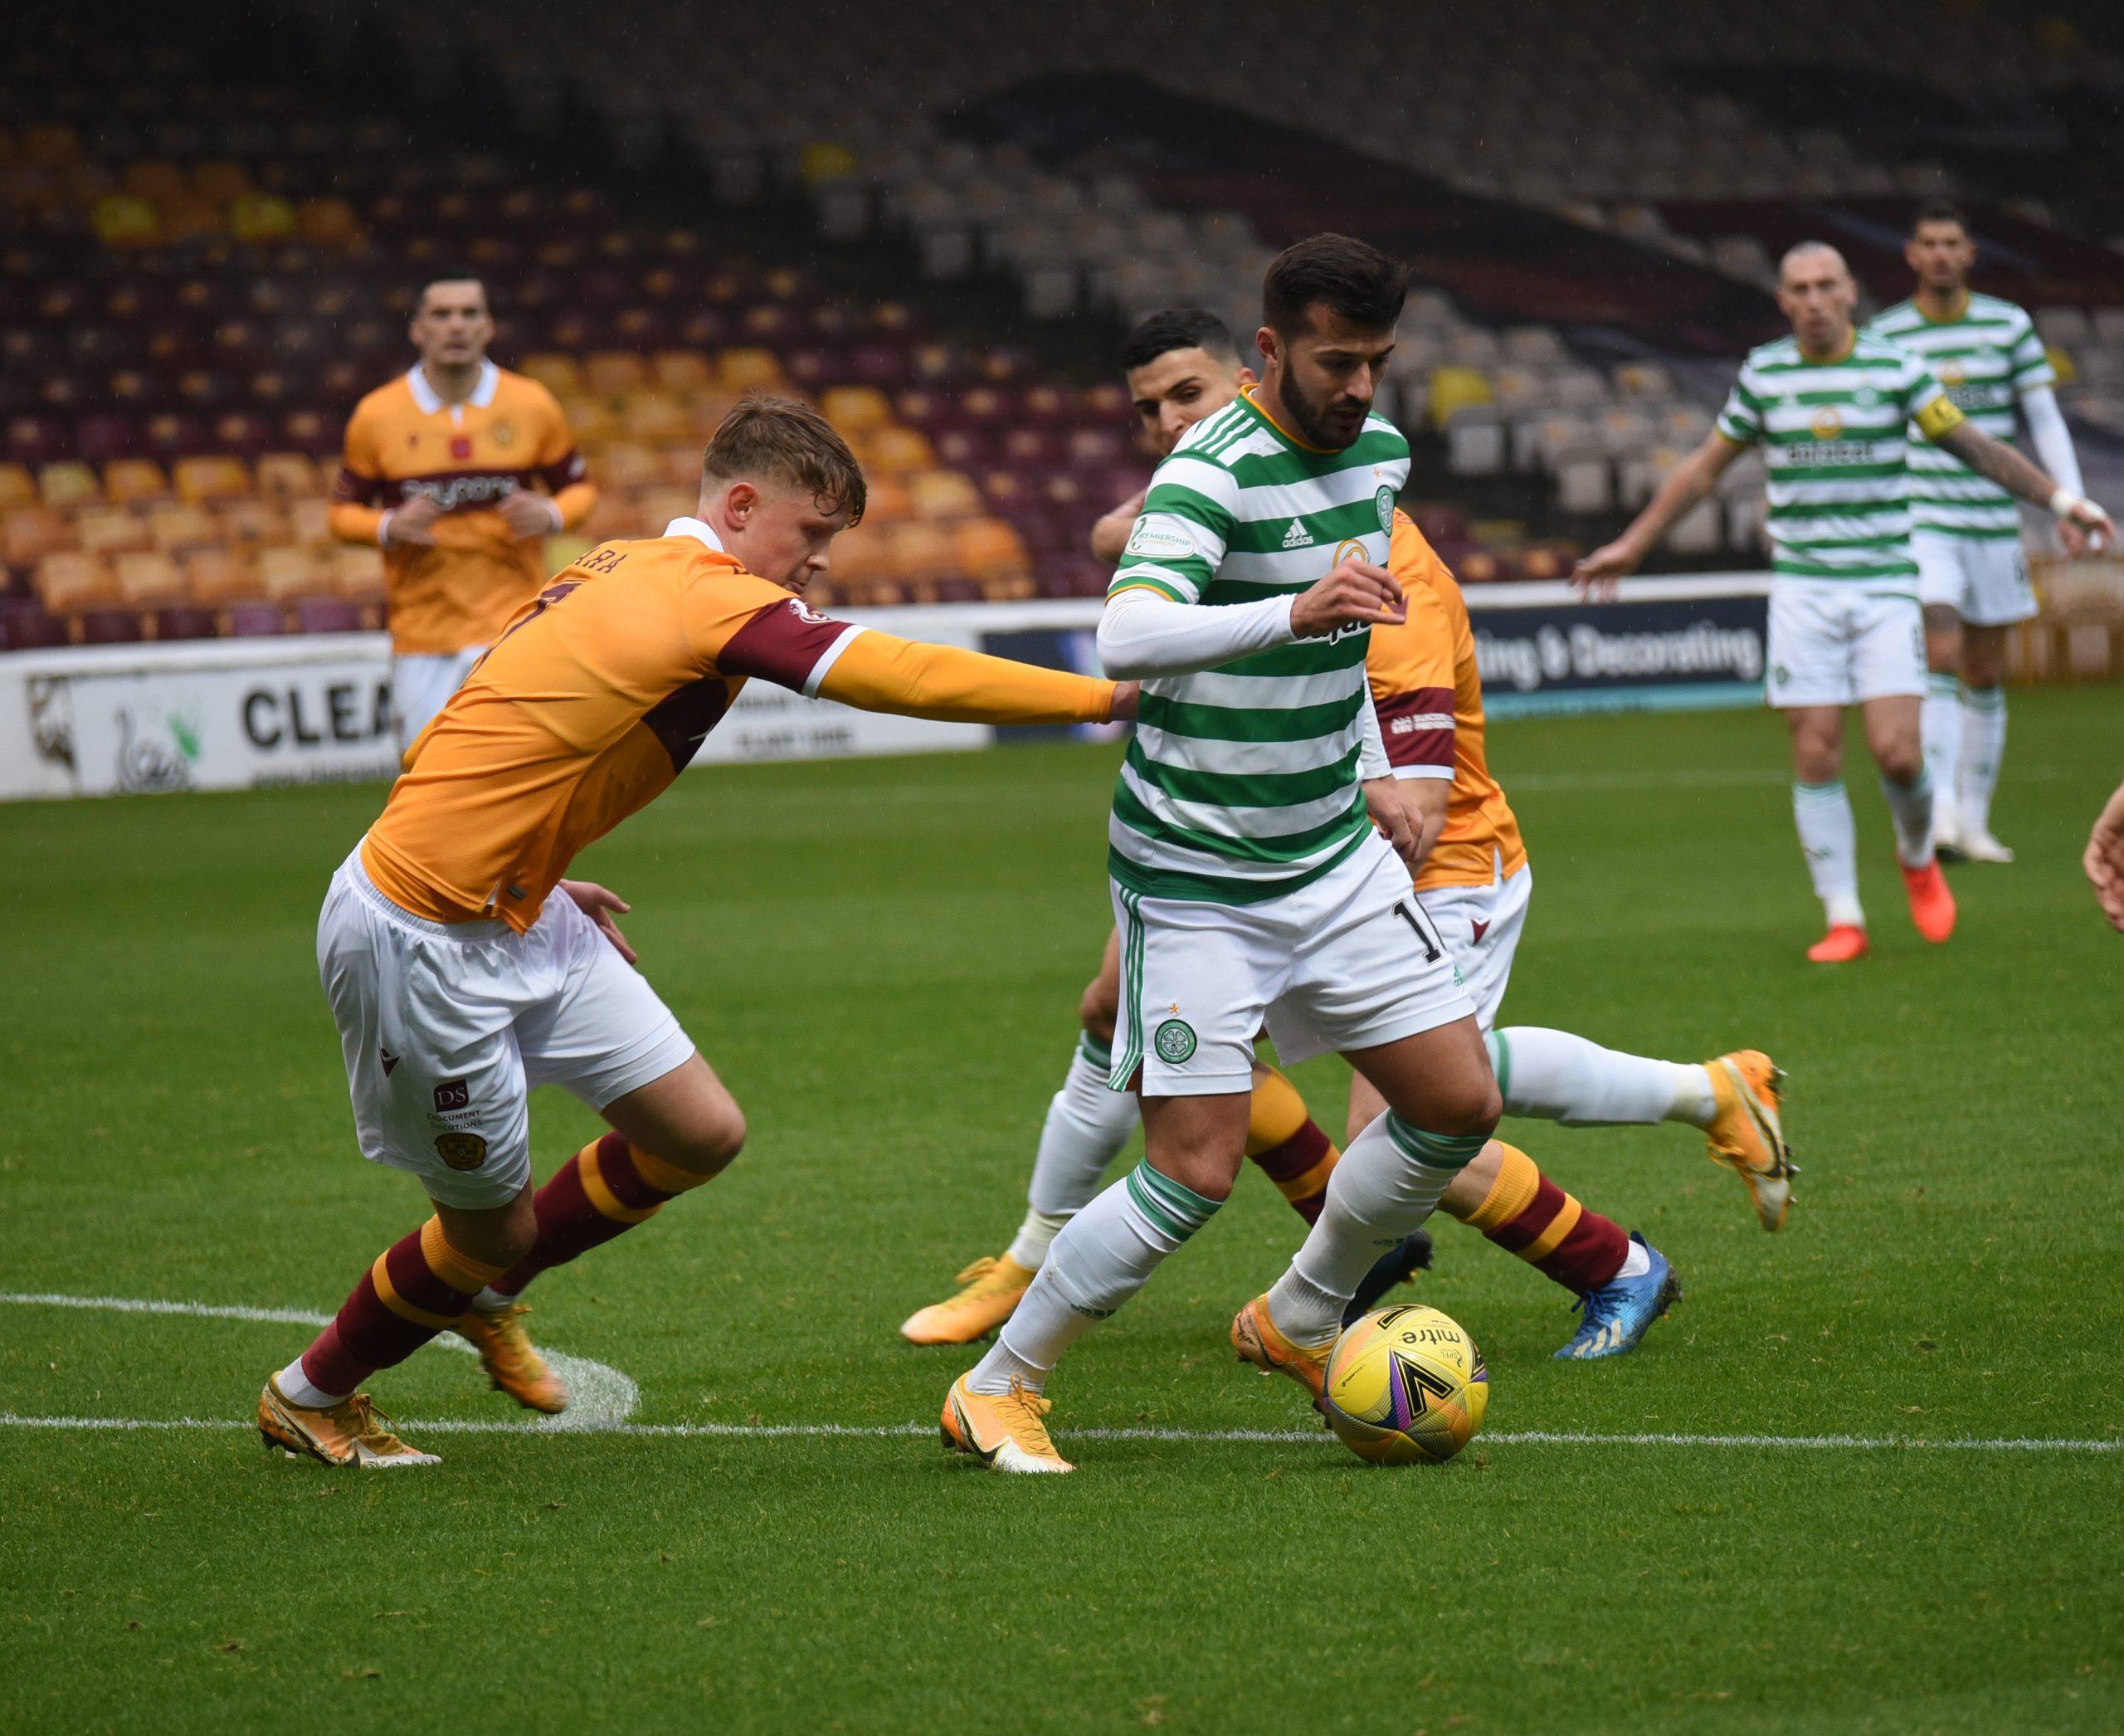 Motherwell v Celtic , 8 November 2020 , Scottish Premiership, photograph by David Rankin , News Pictures Scotland , phone 07723-538941 www.newspicturesscotland.co.uk